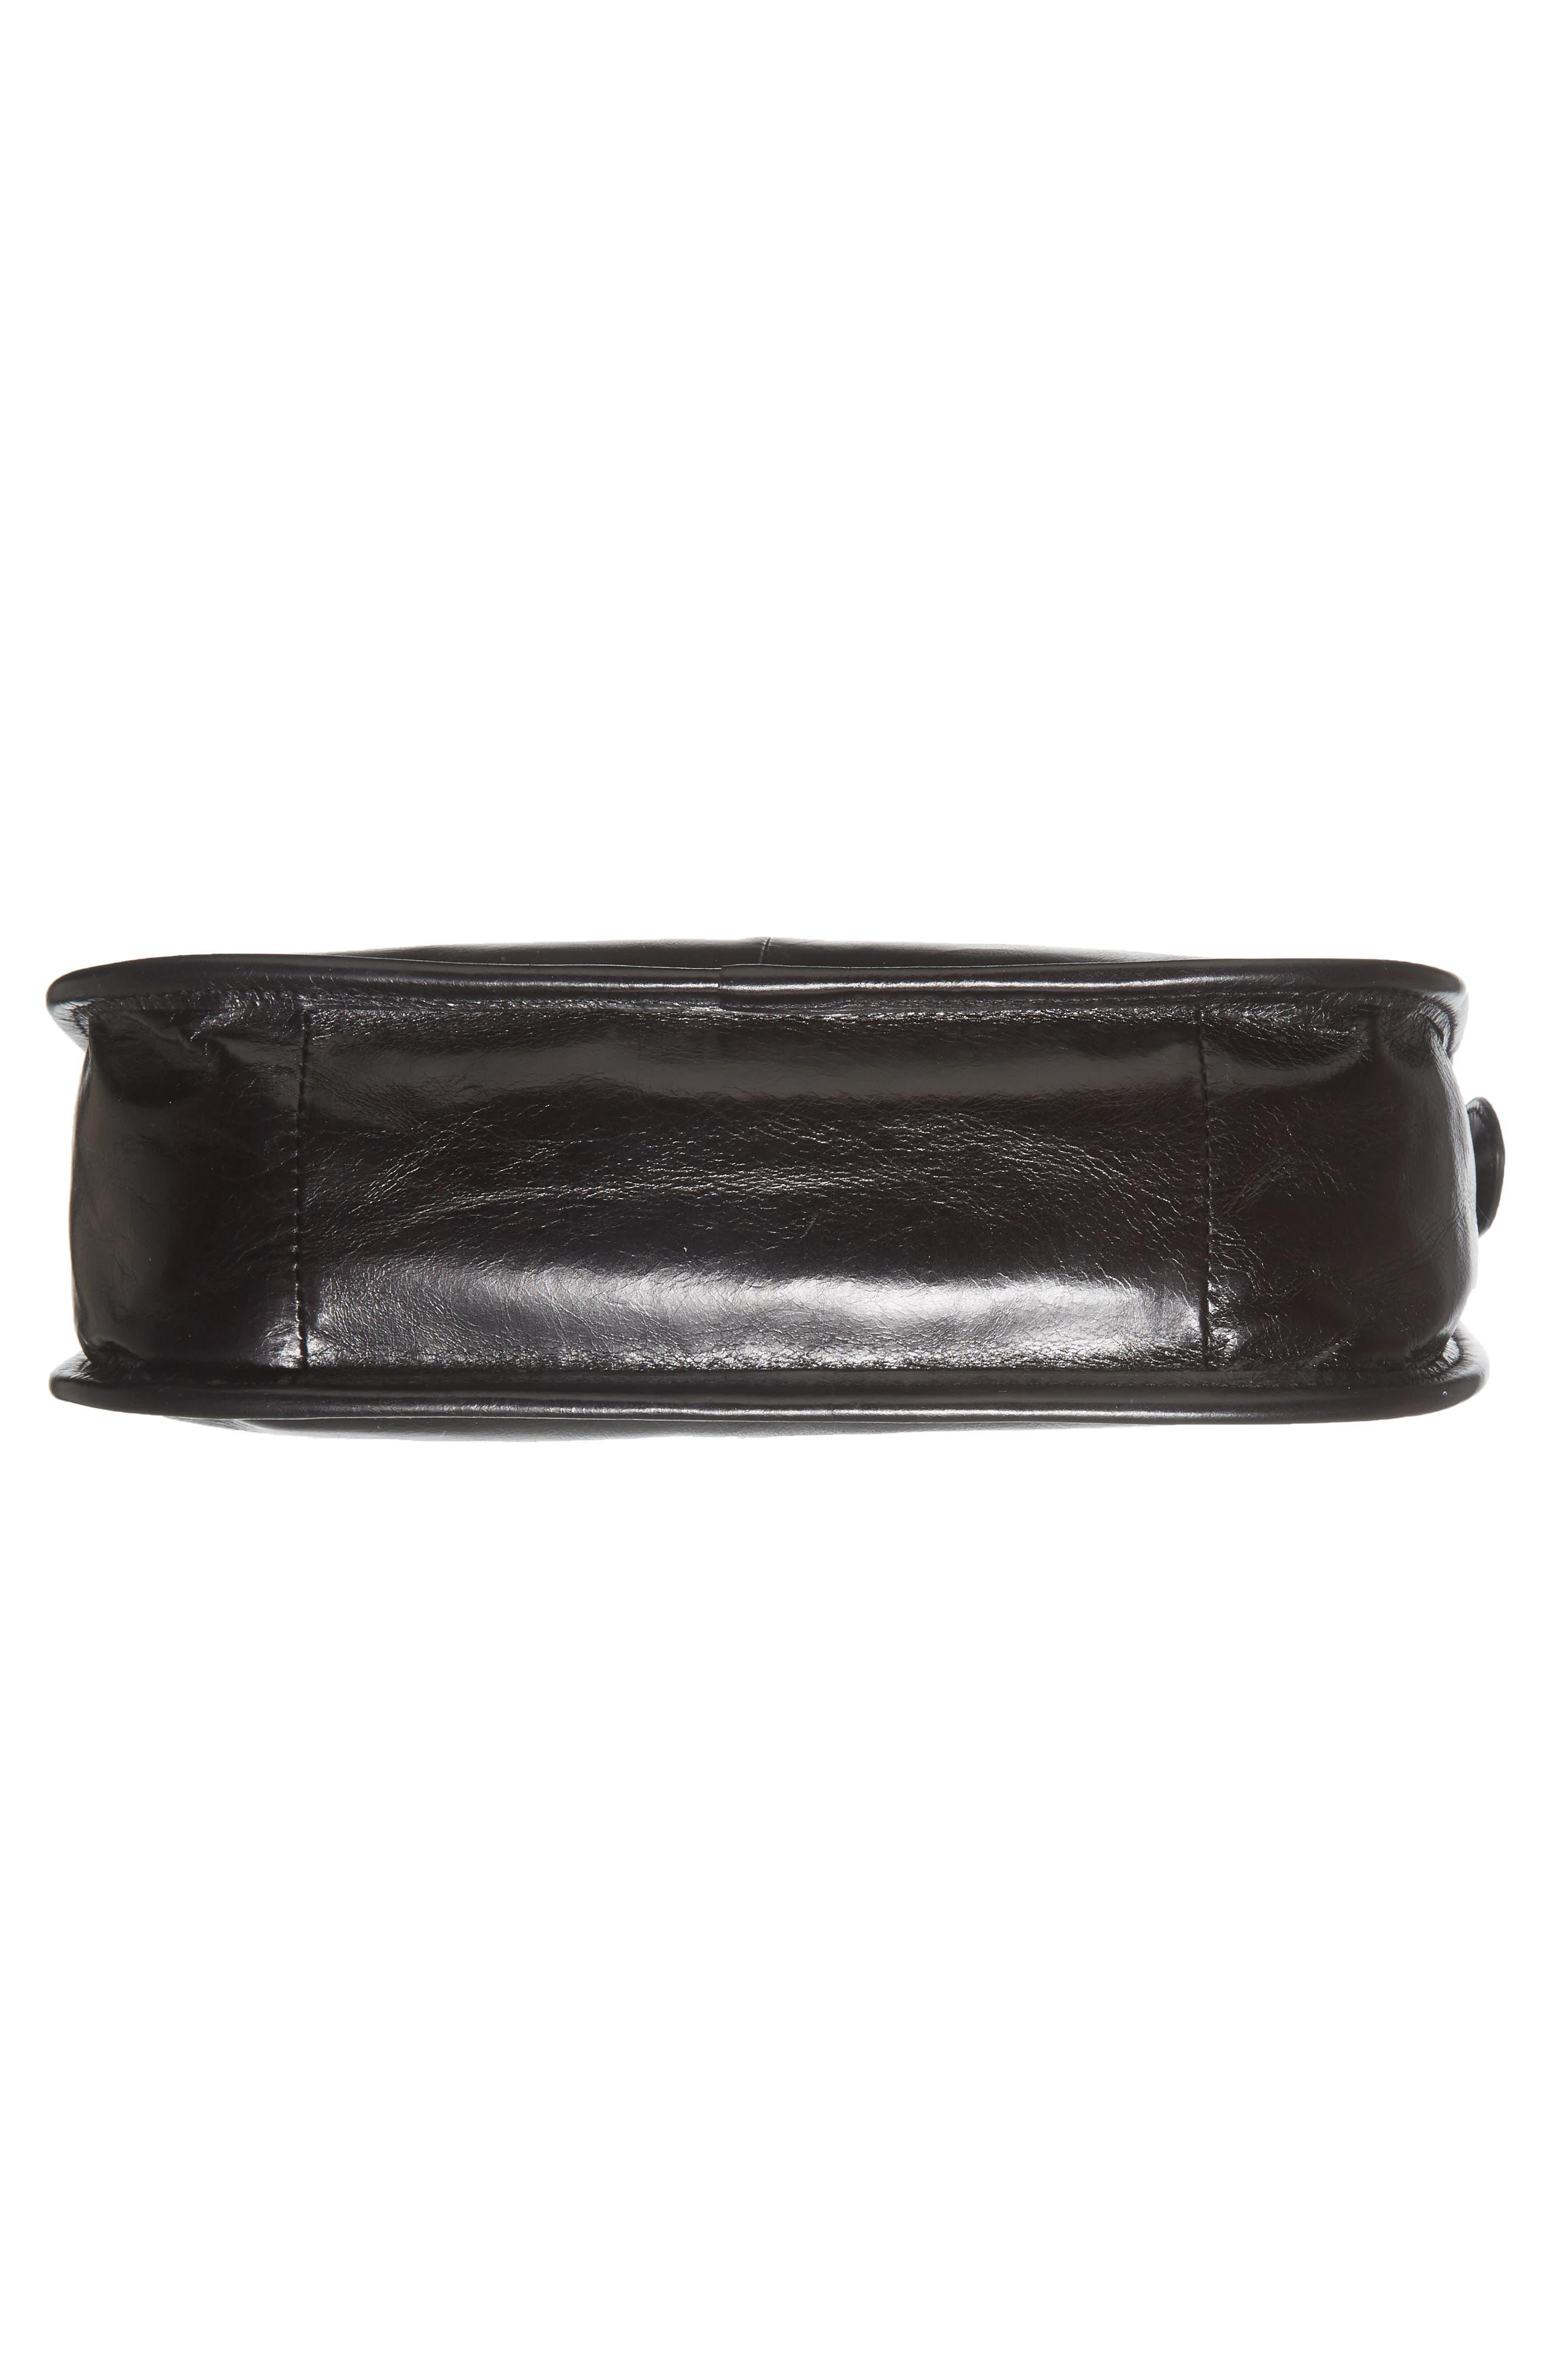 Chase Calfskin Leather Crossbody Bag,                             Alternate thumbnail 6, color,                             BLACK